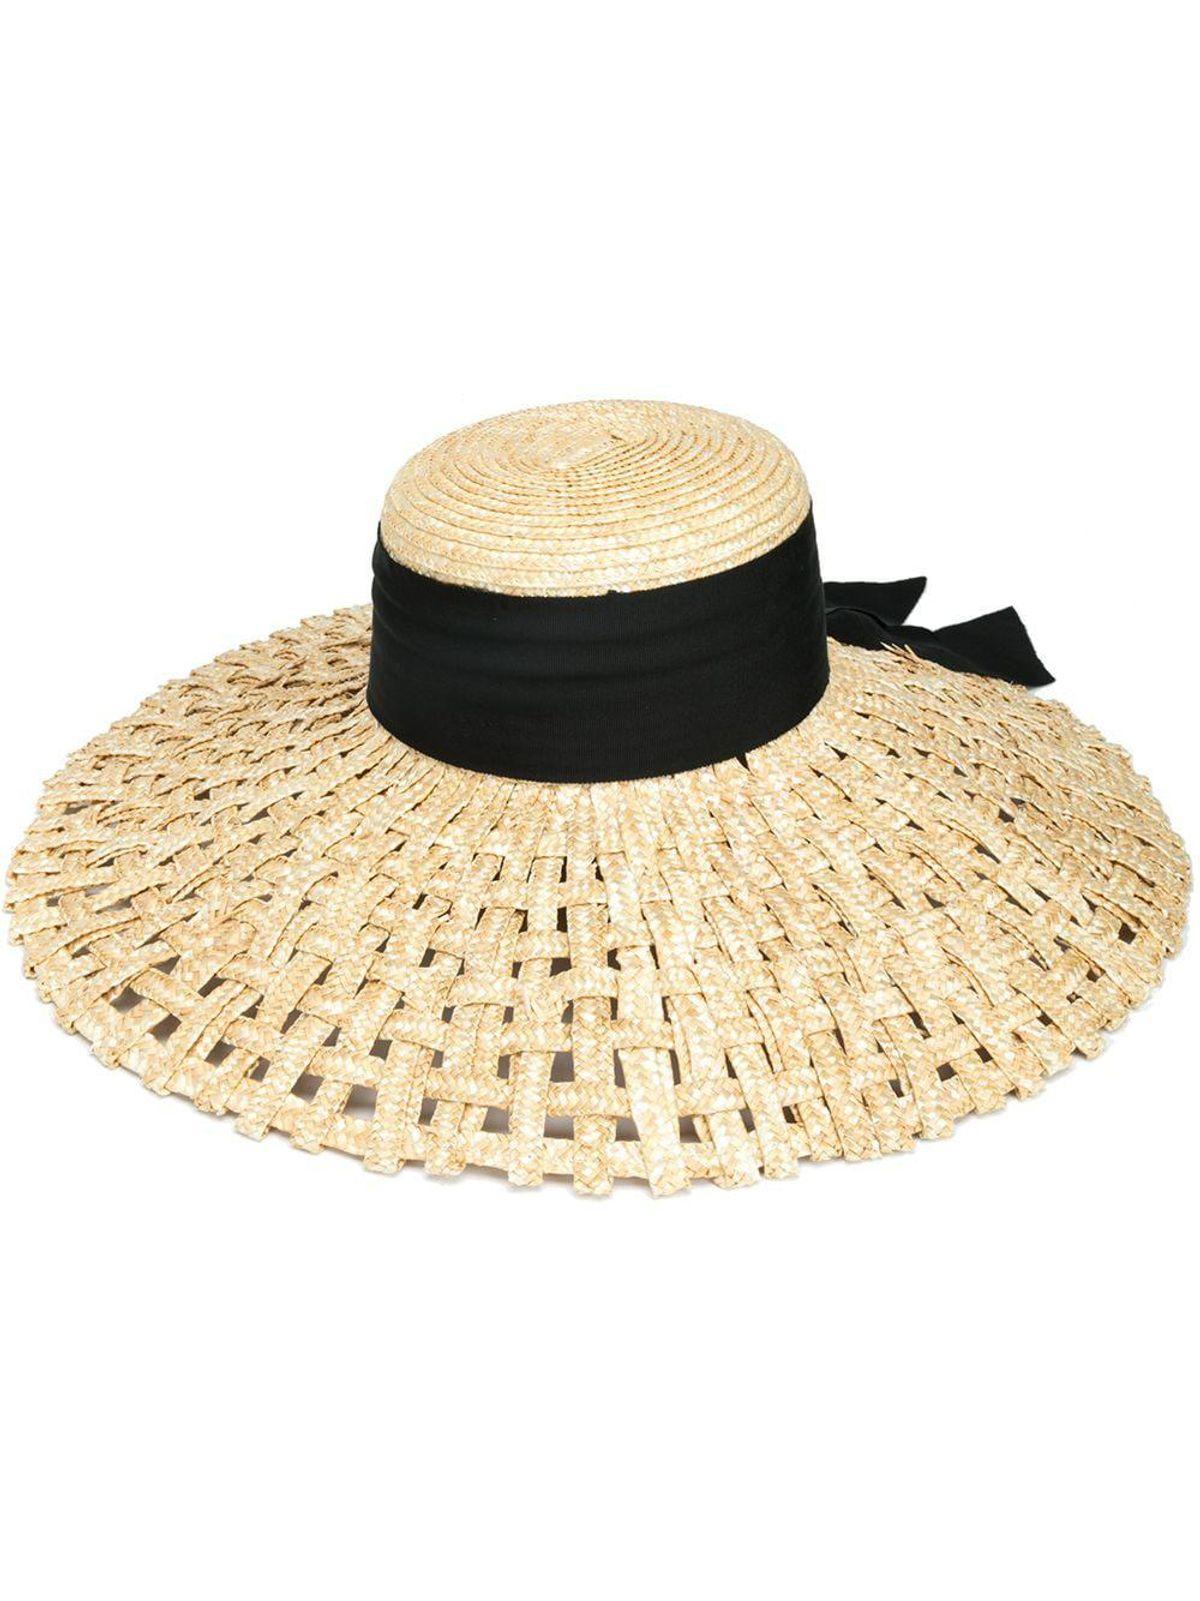 Mirabel Straw Sun Hat